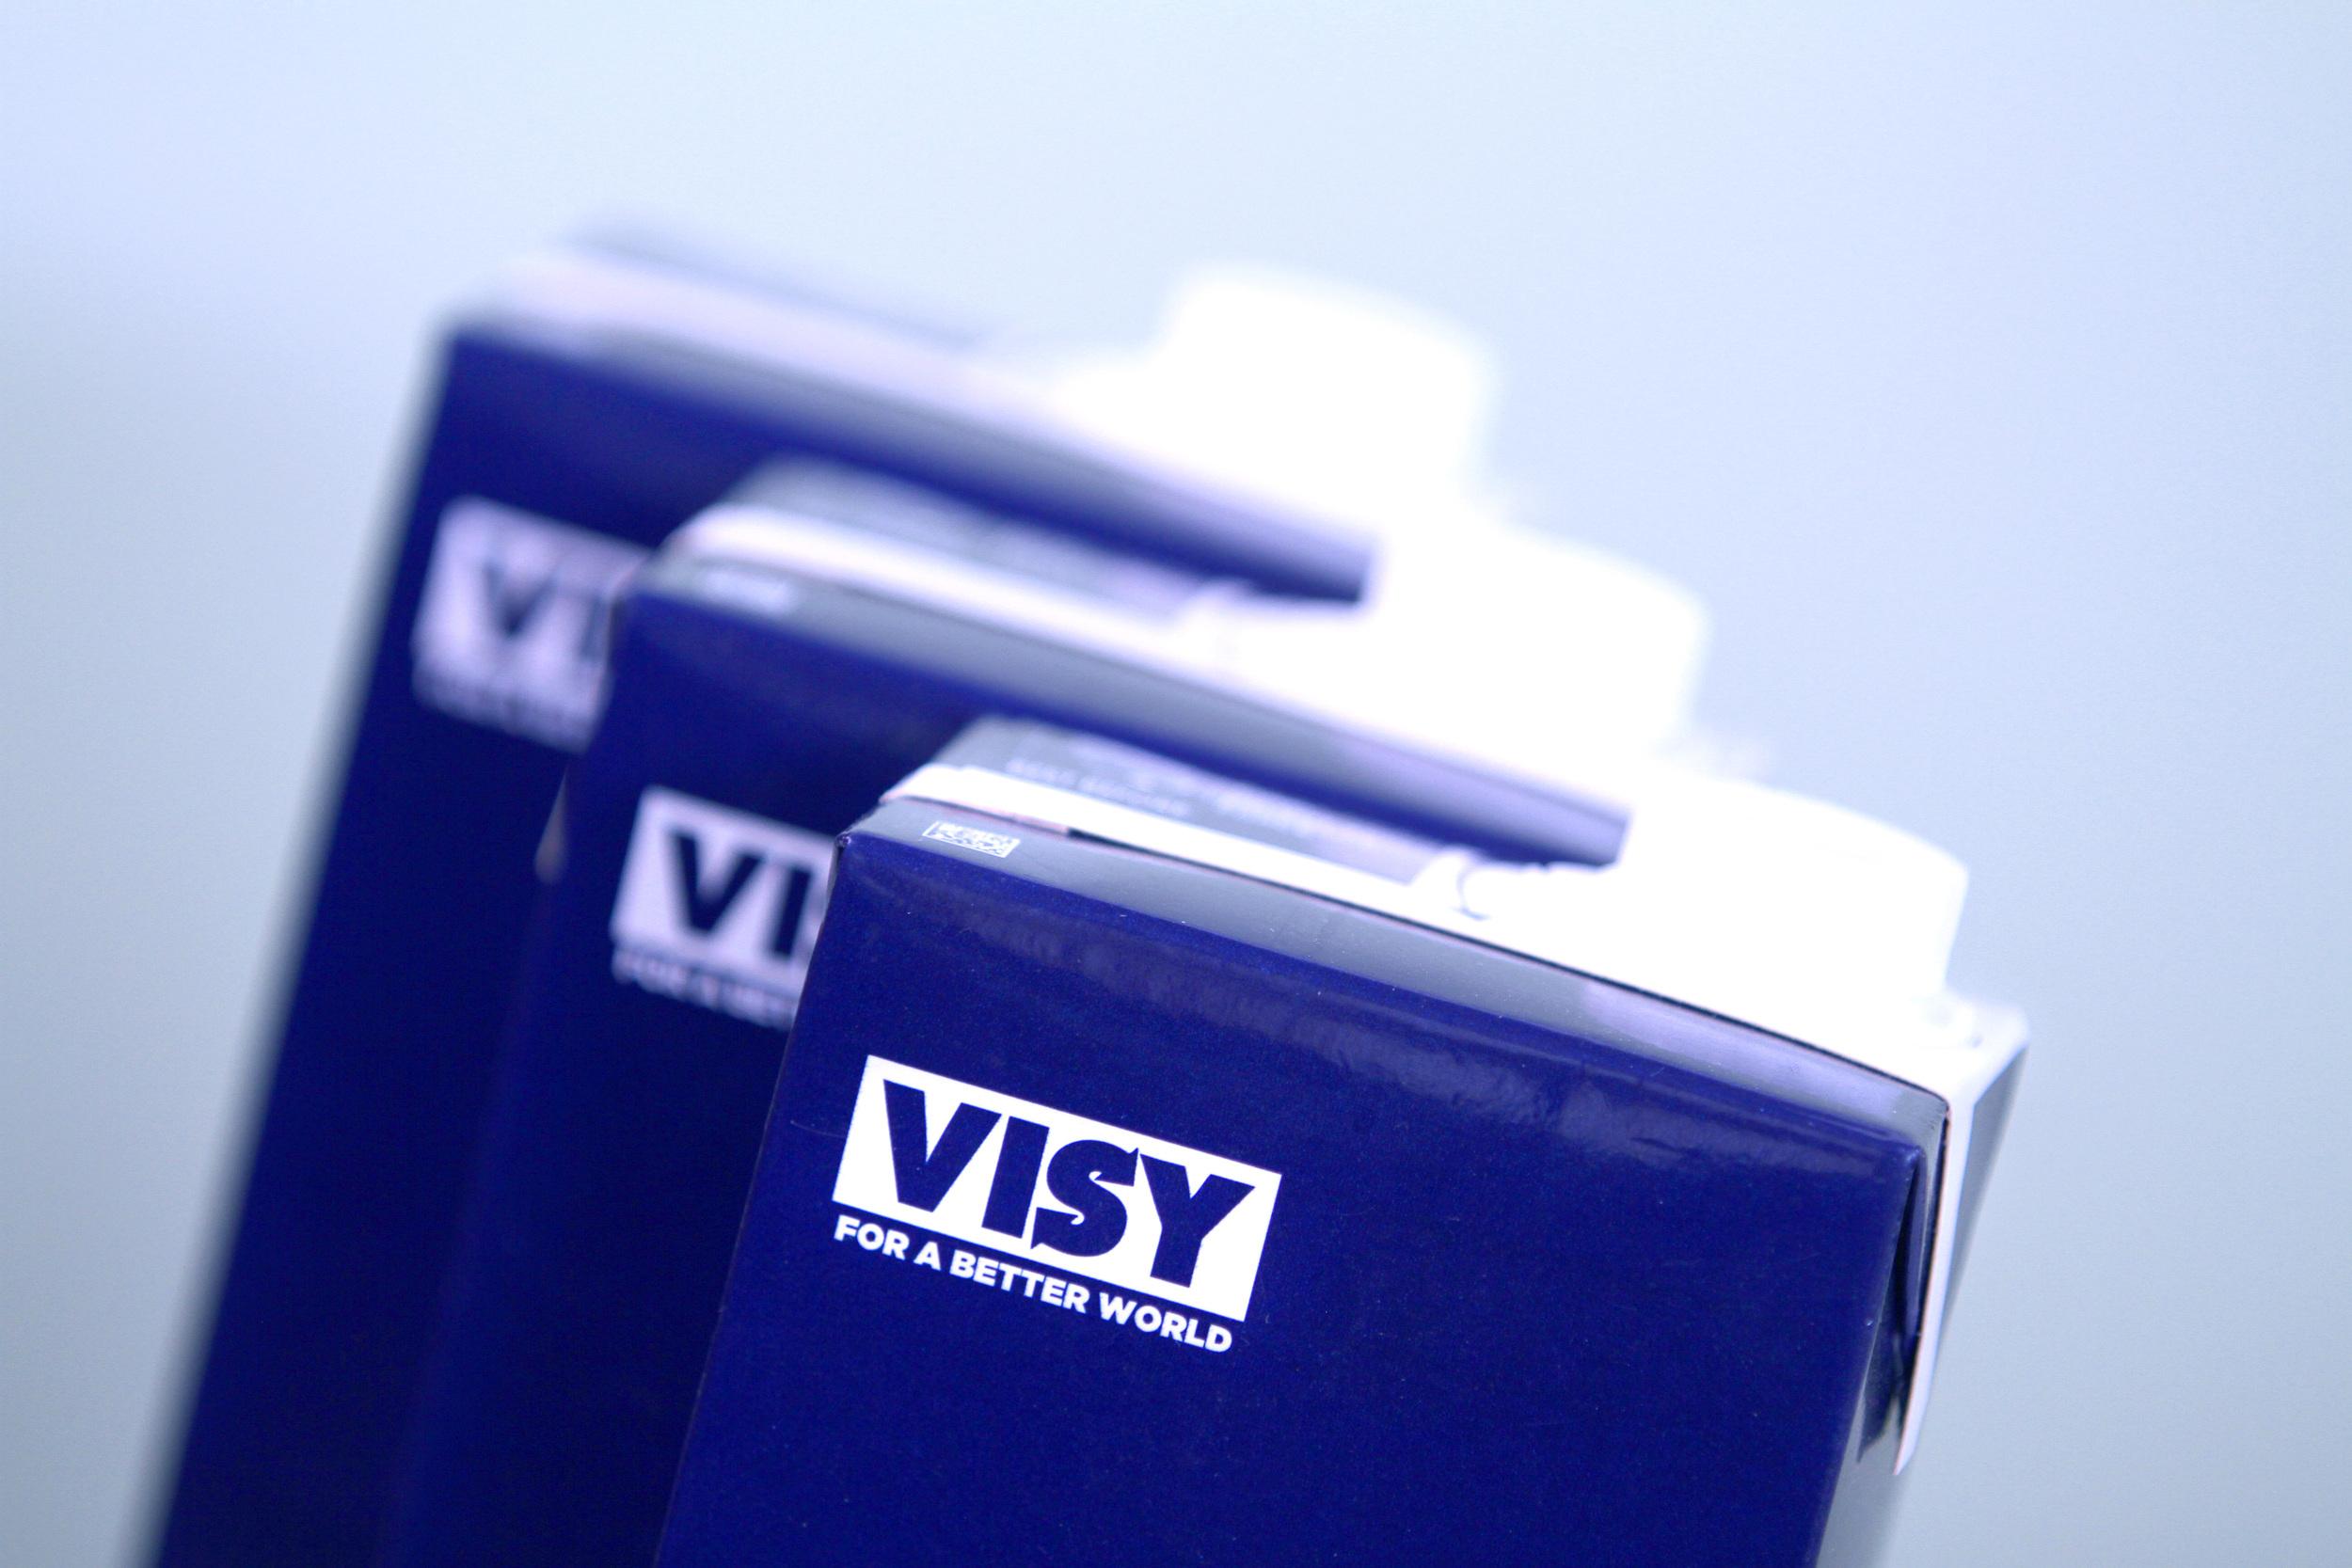 Visy Beverage Cartons - Aseptic Packaging